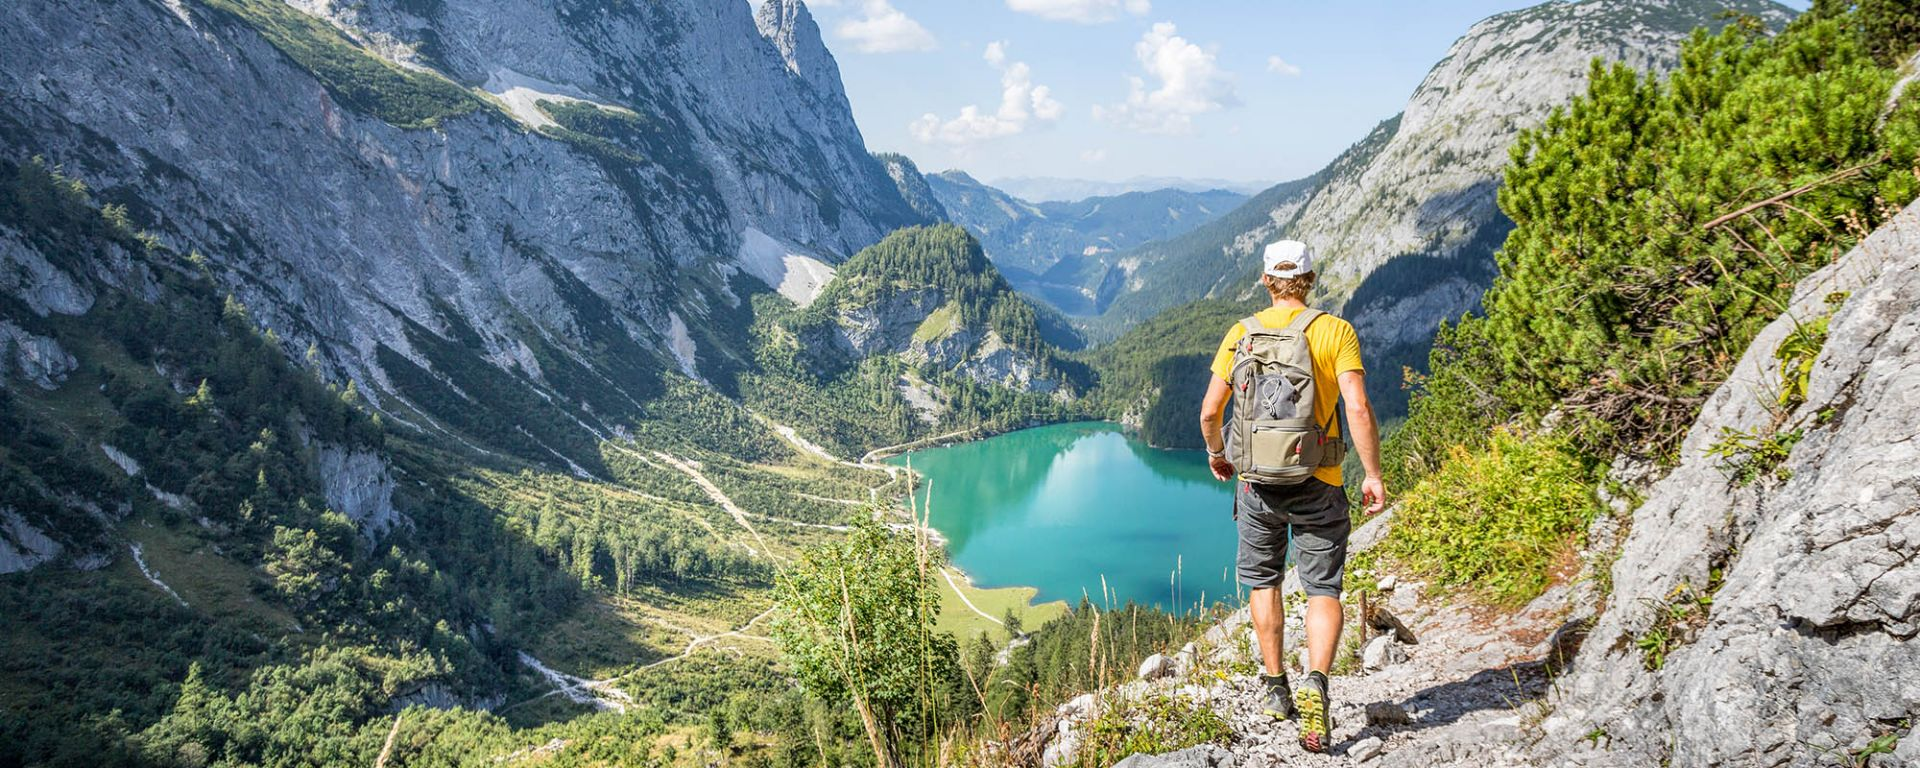 Kitzbühel Austria Walking Tour Header